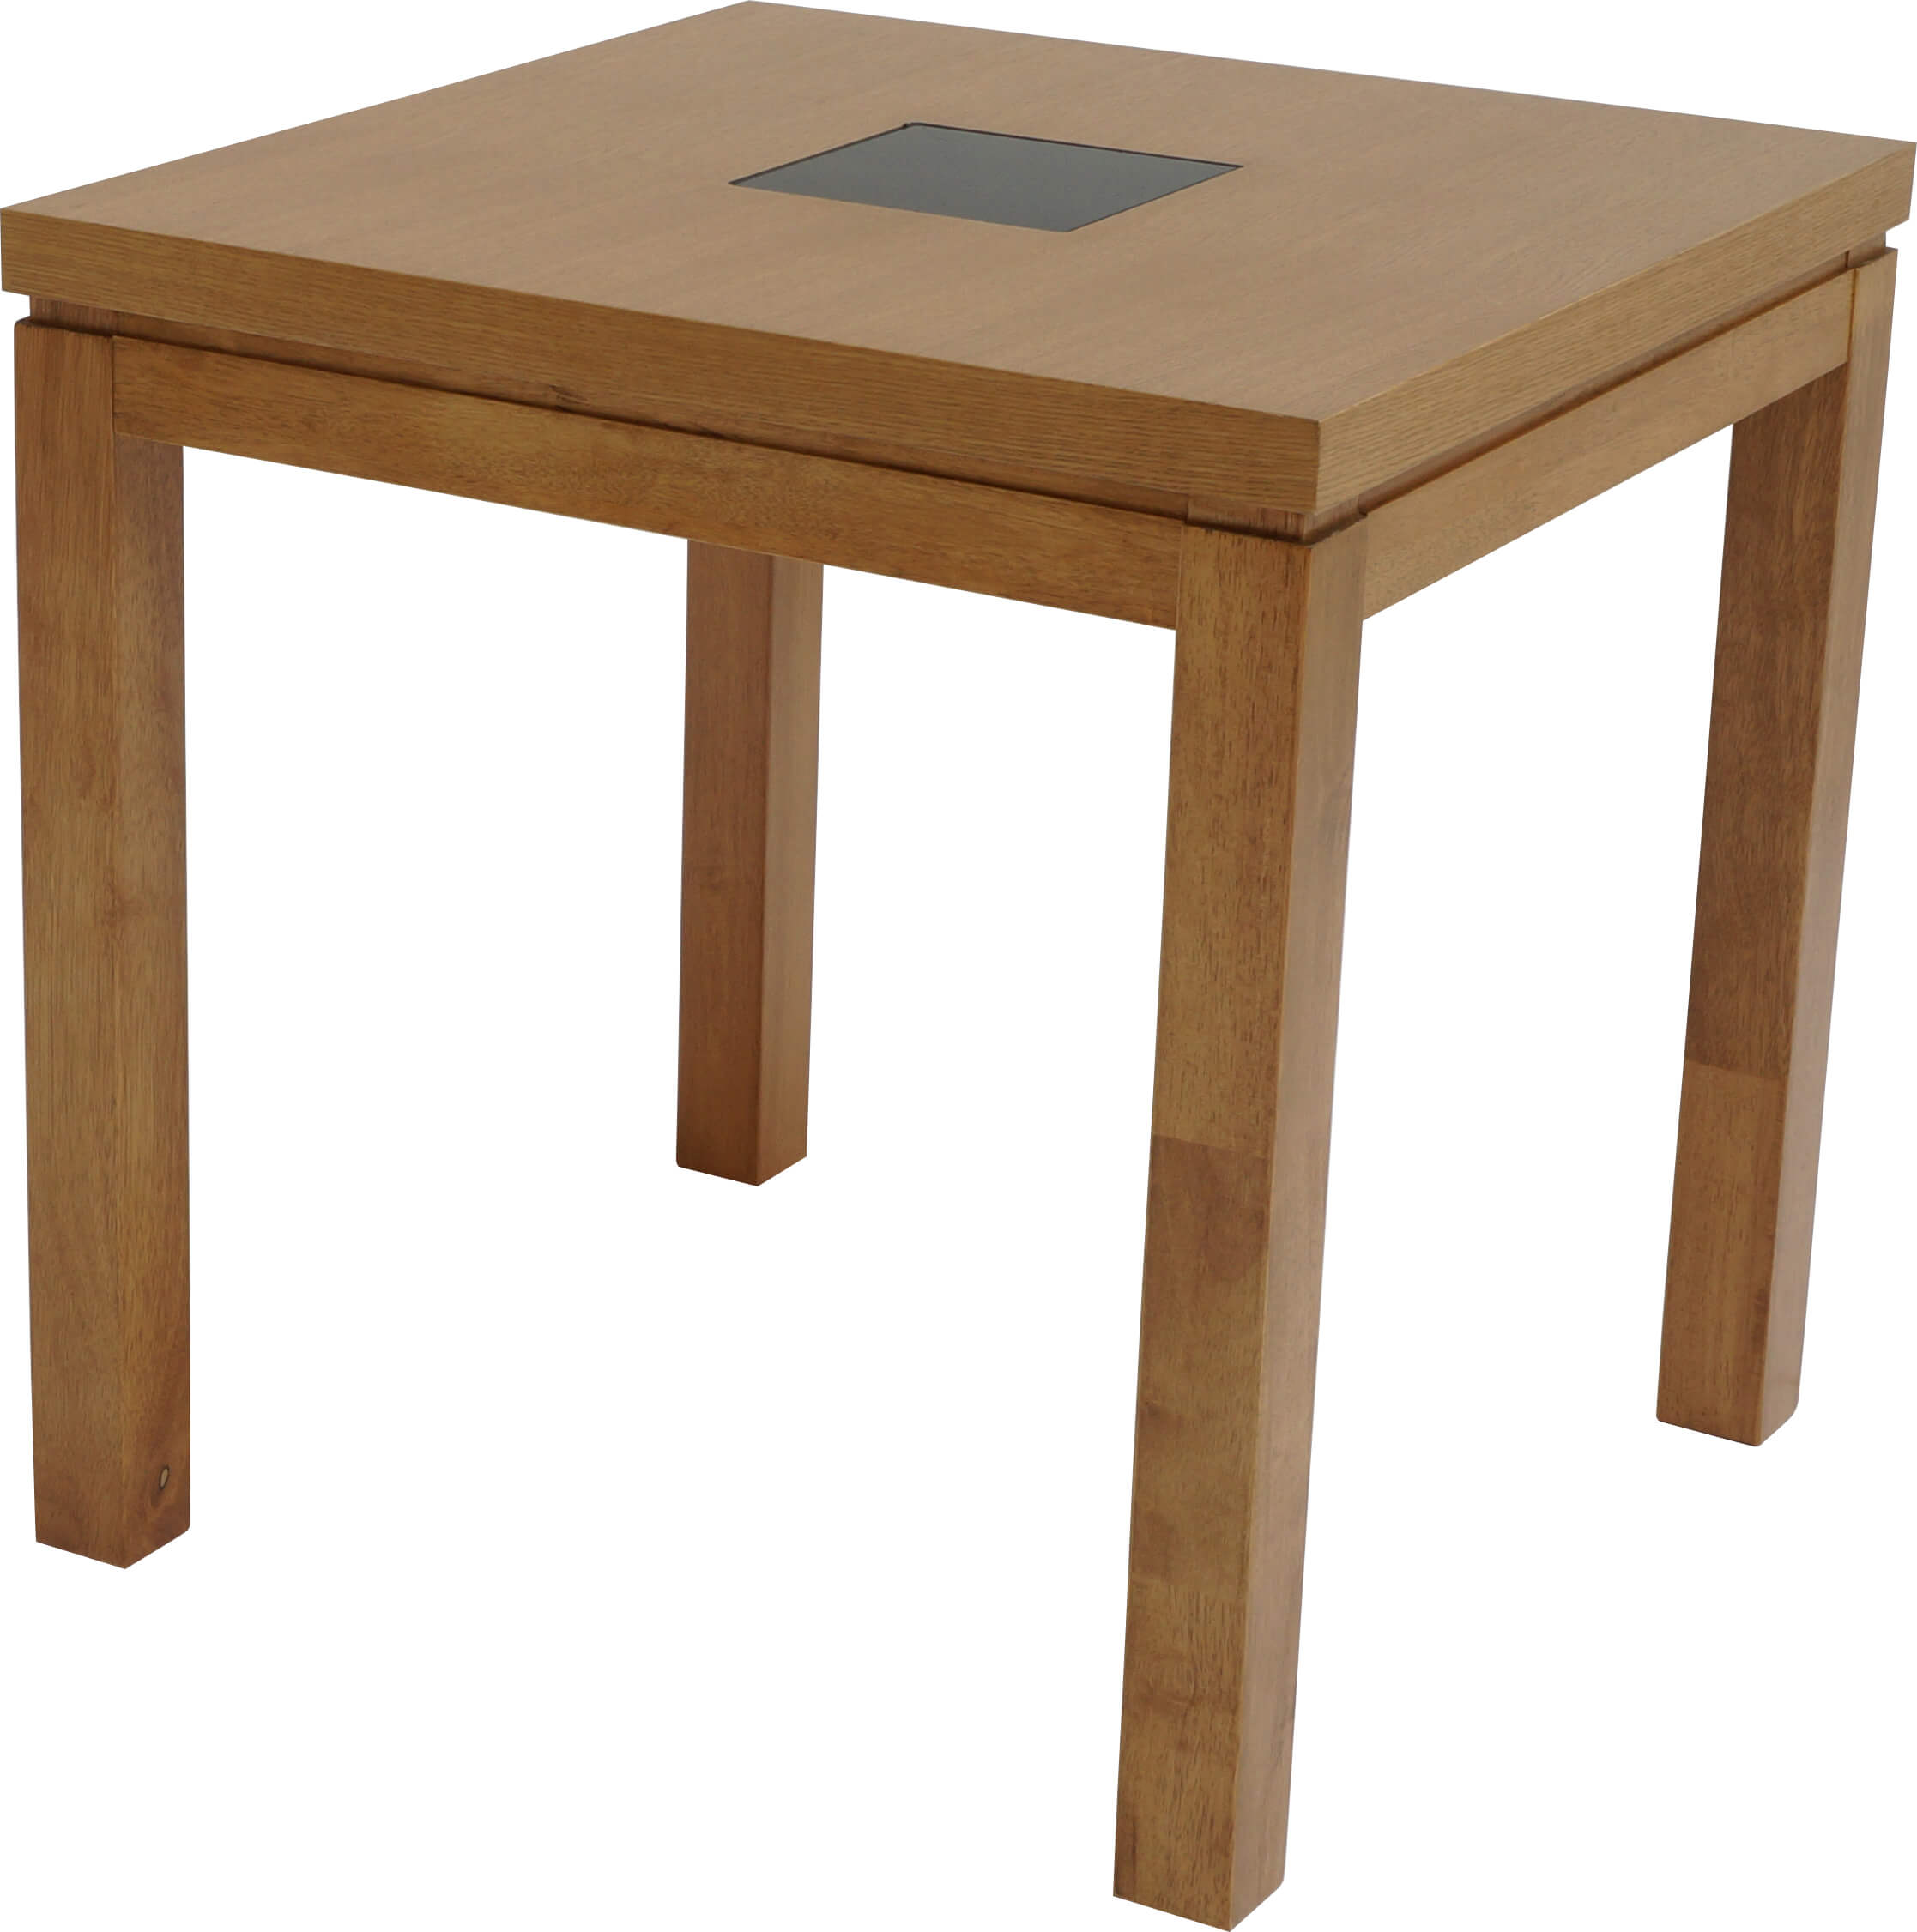 Sydney Walnut 0.75 Square Table